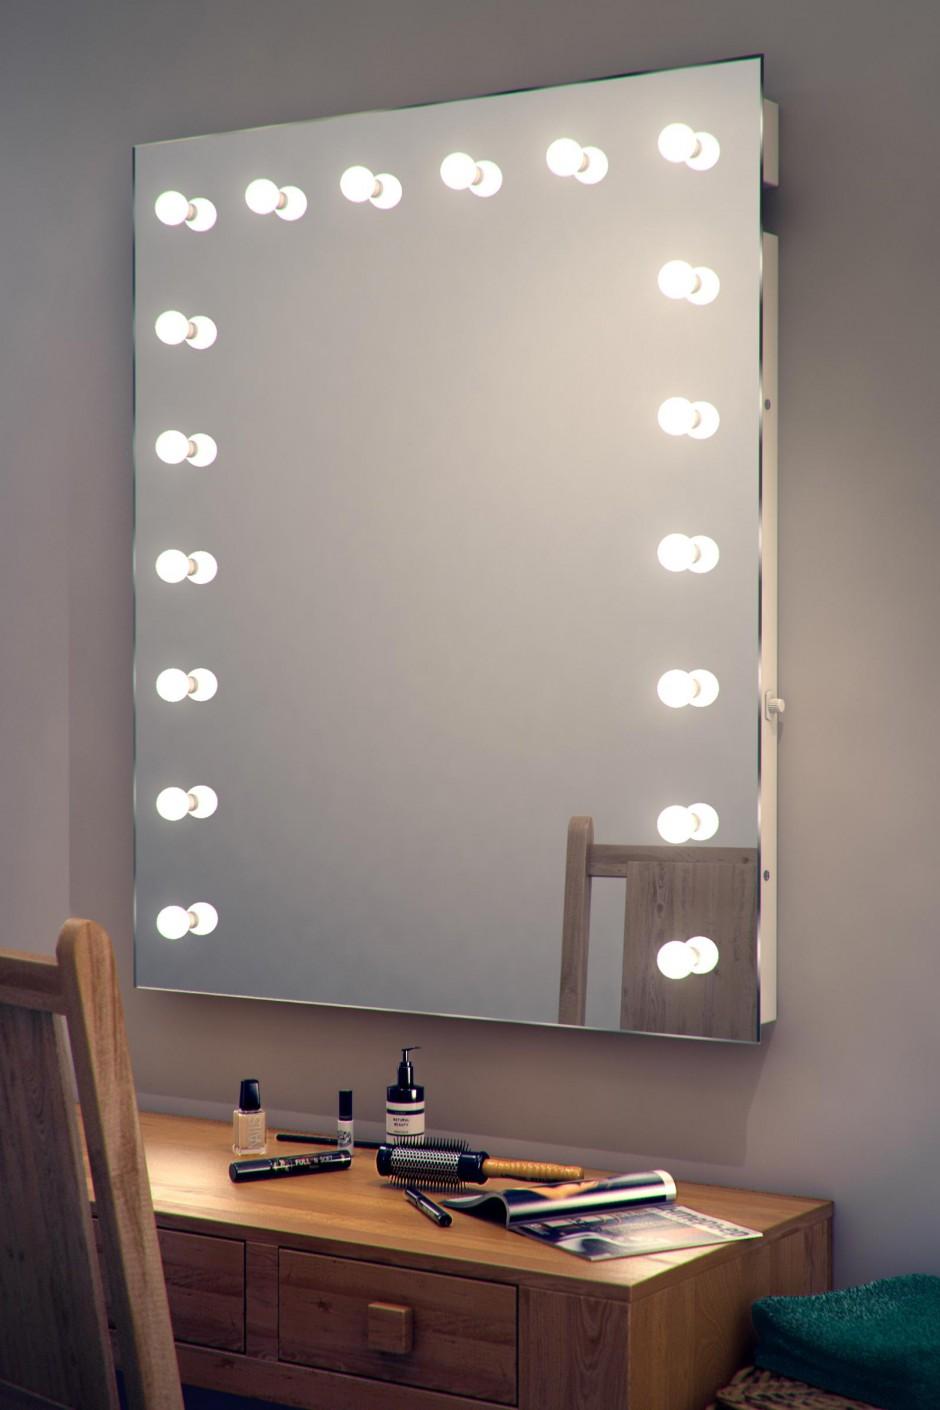 Makeup Vanity Table With Lighted Mirror | Makeup Table Ikea | Makeup Vanity Lights